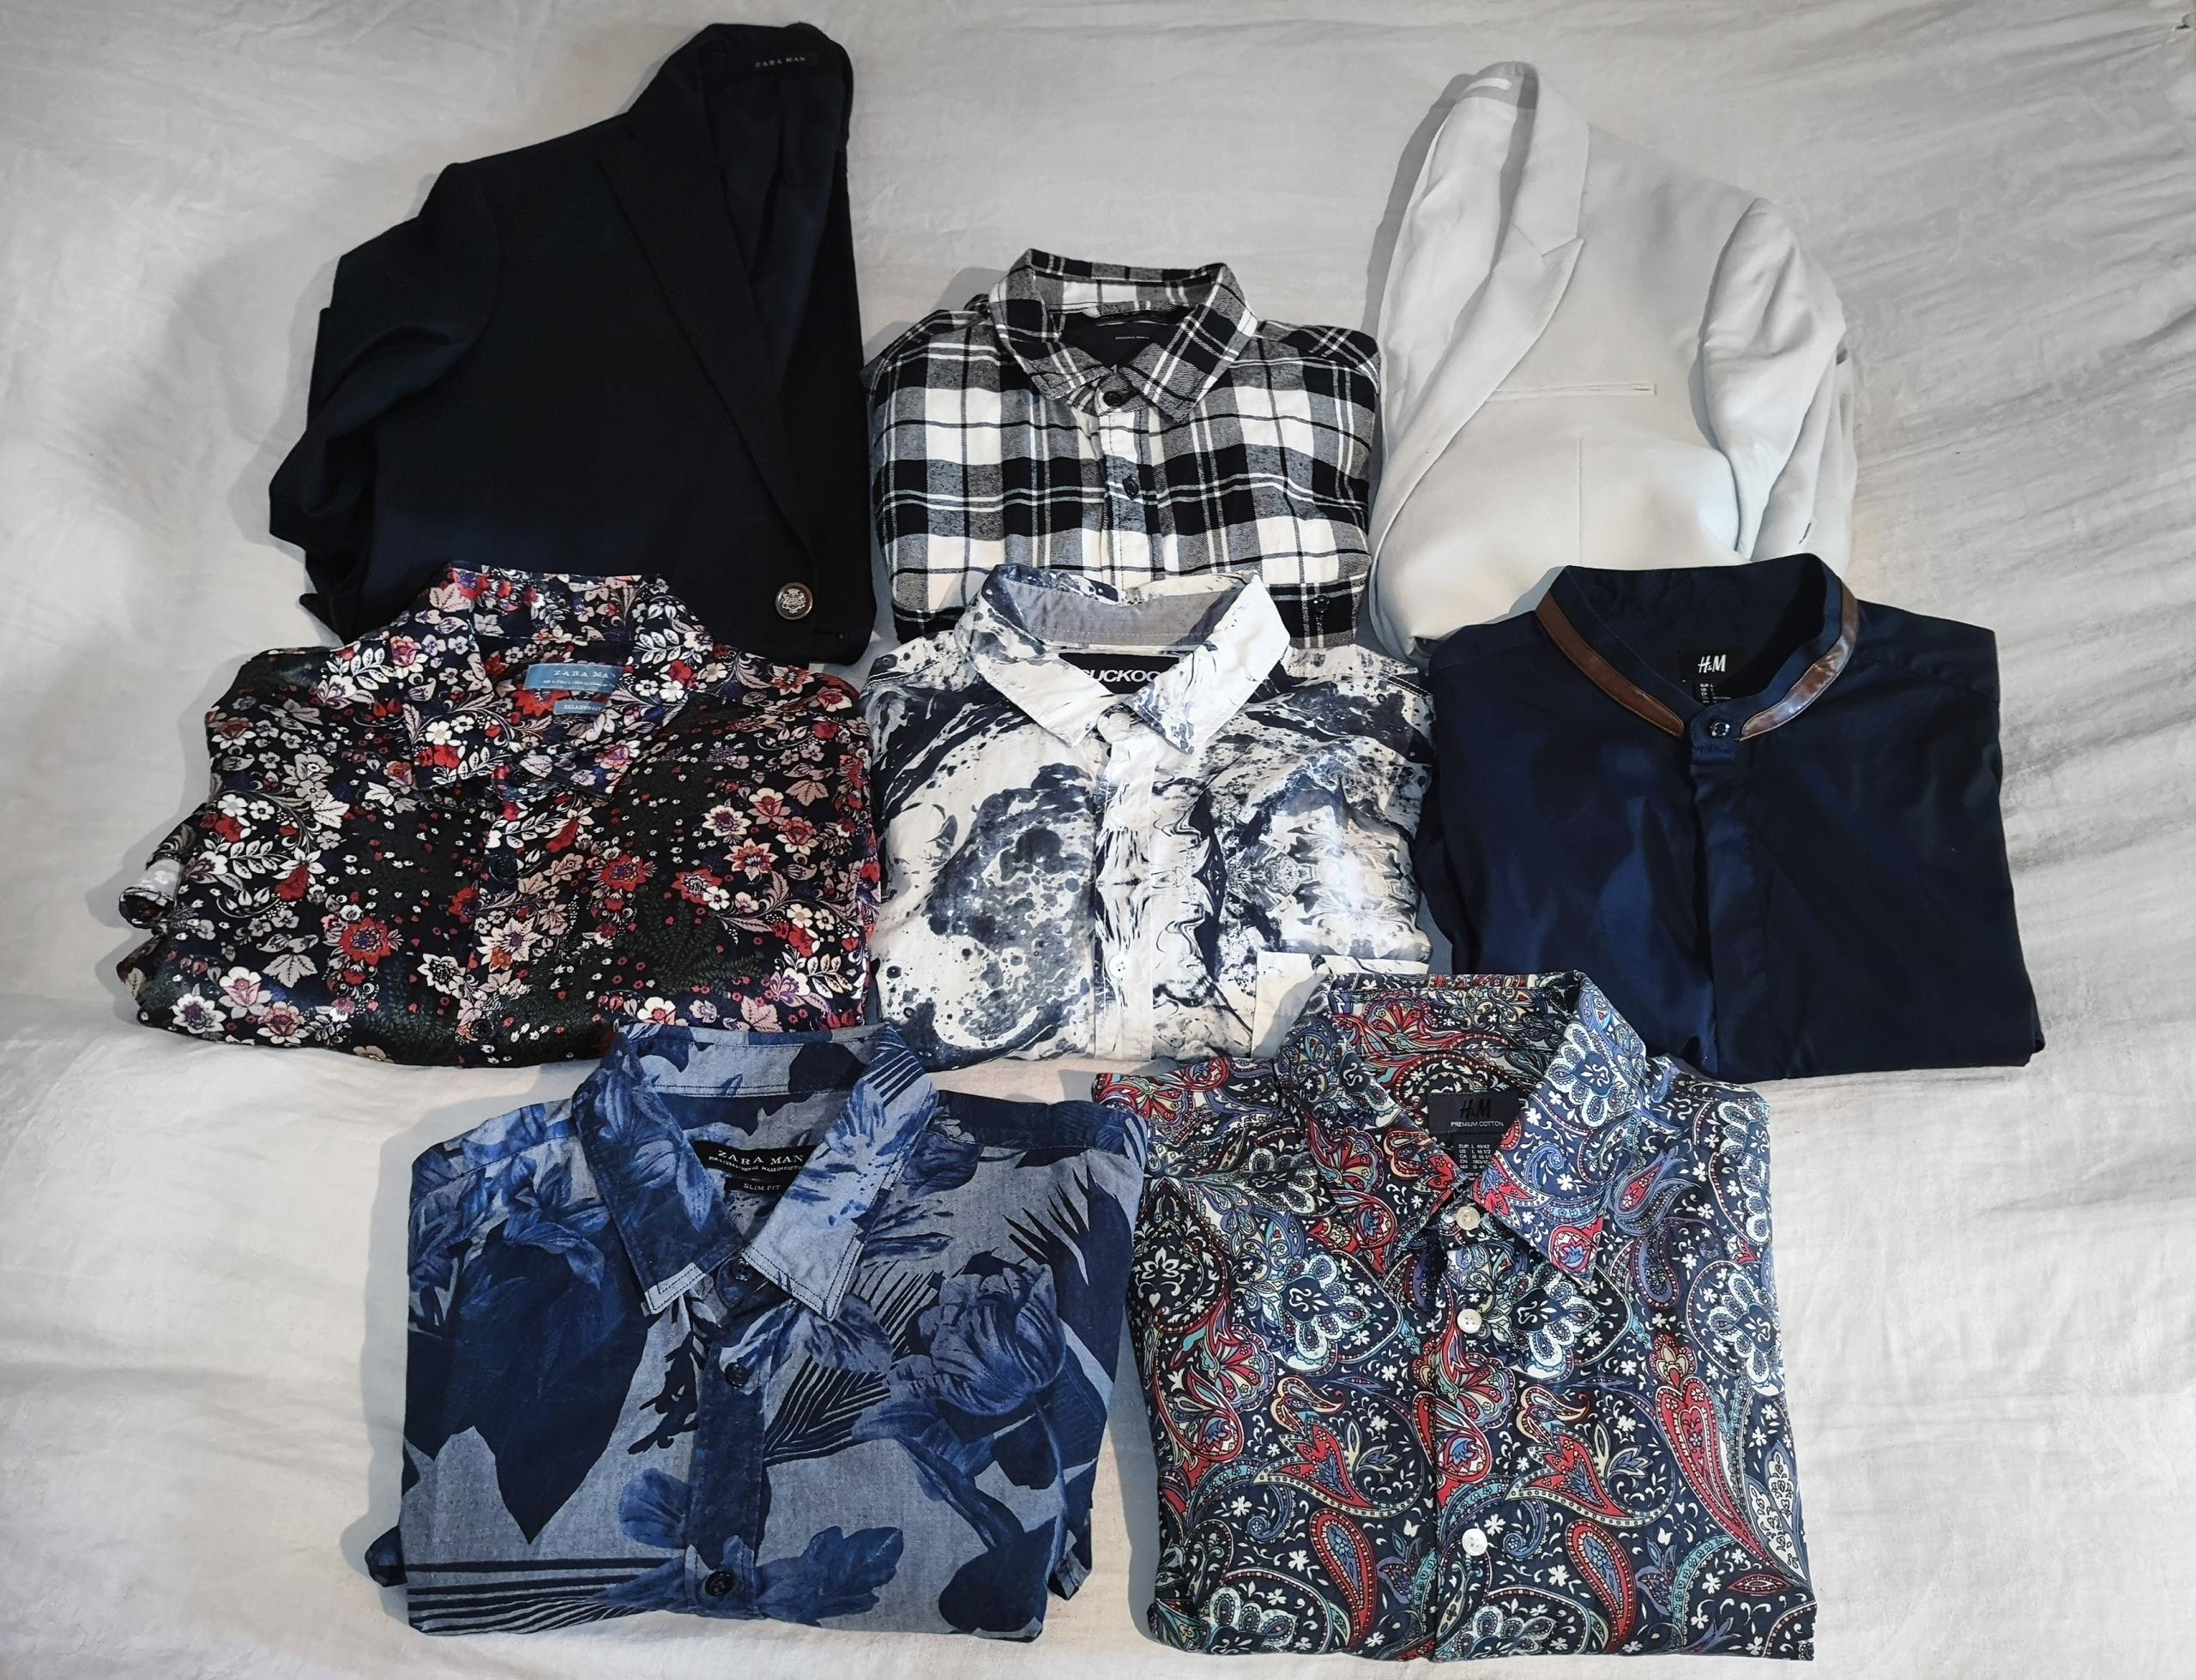 Markowe Koszule oraz Maryranki Komplet